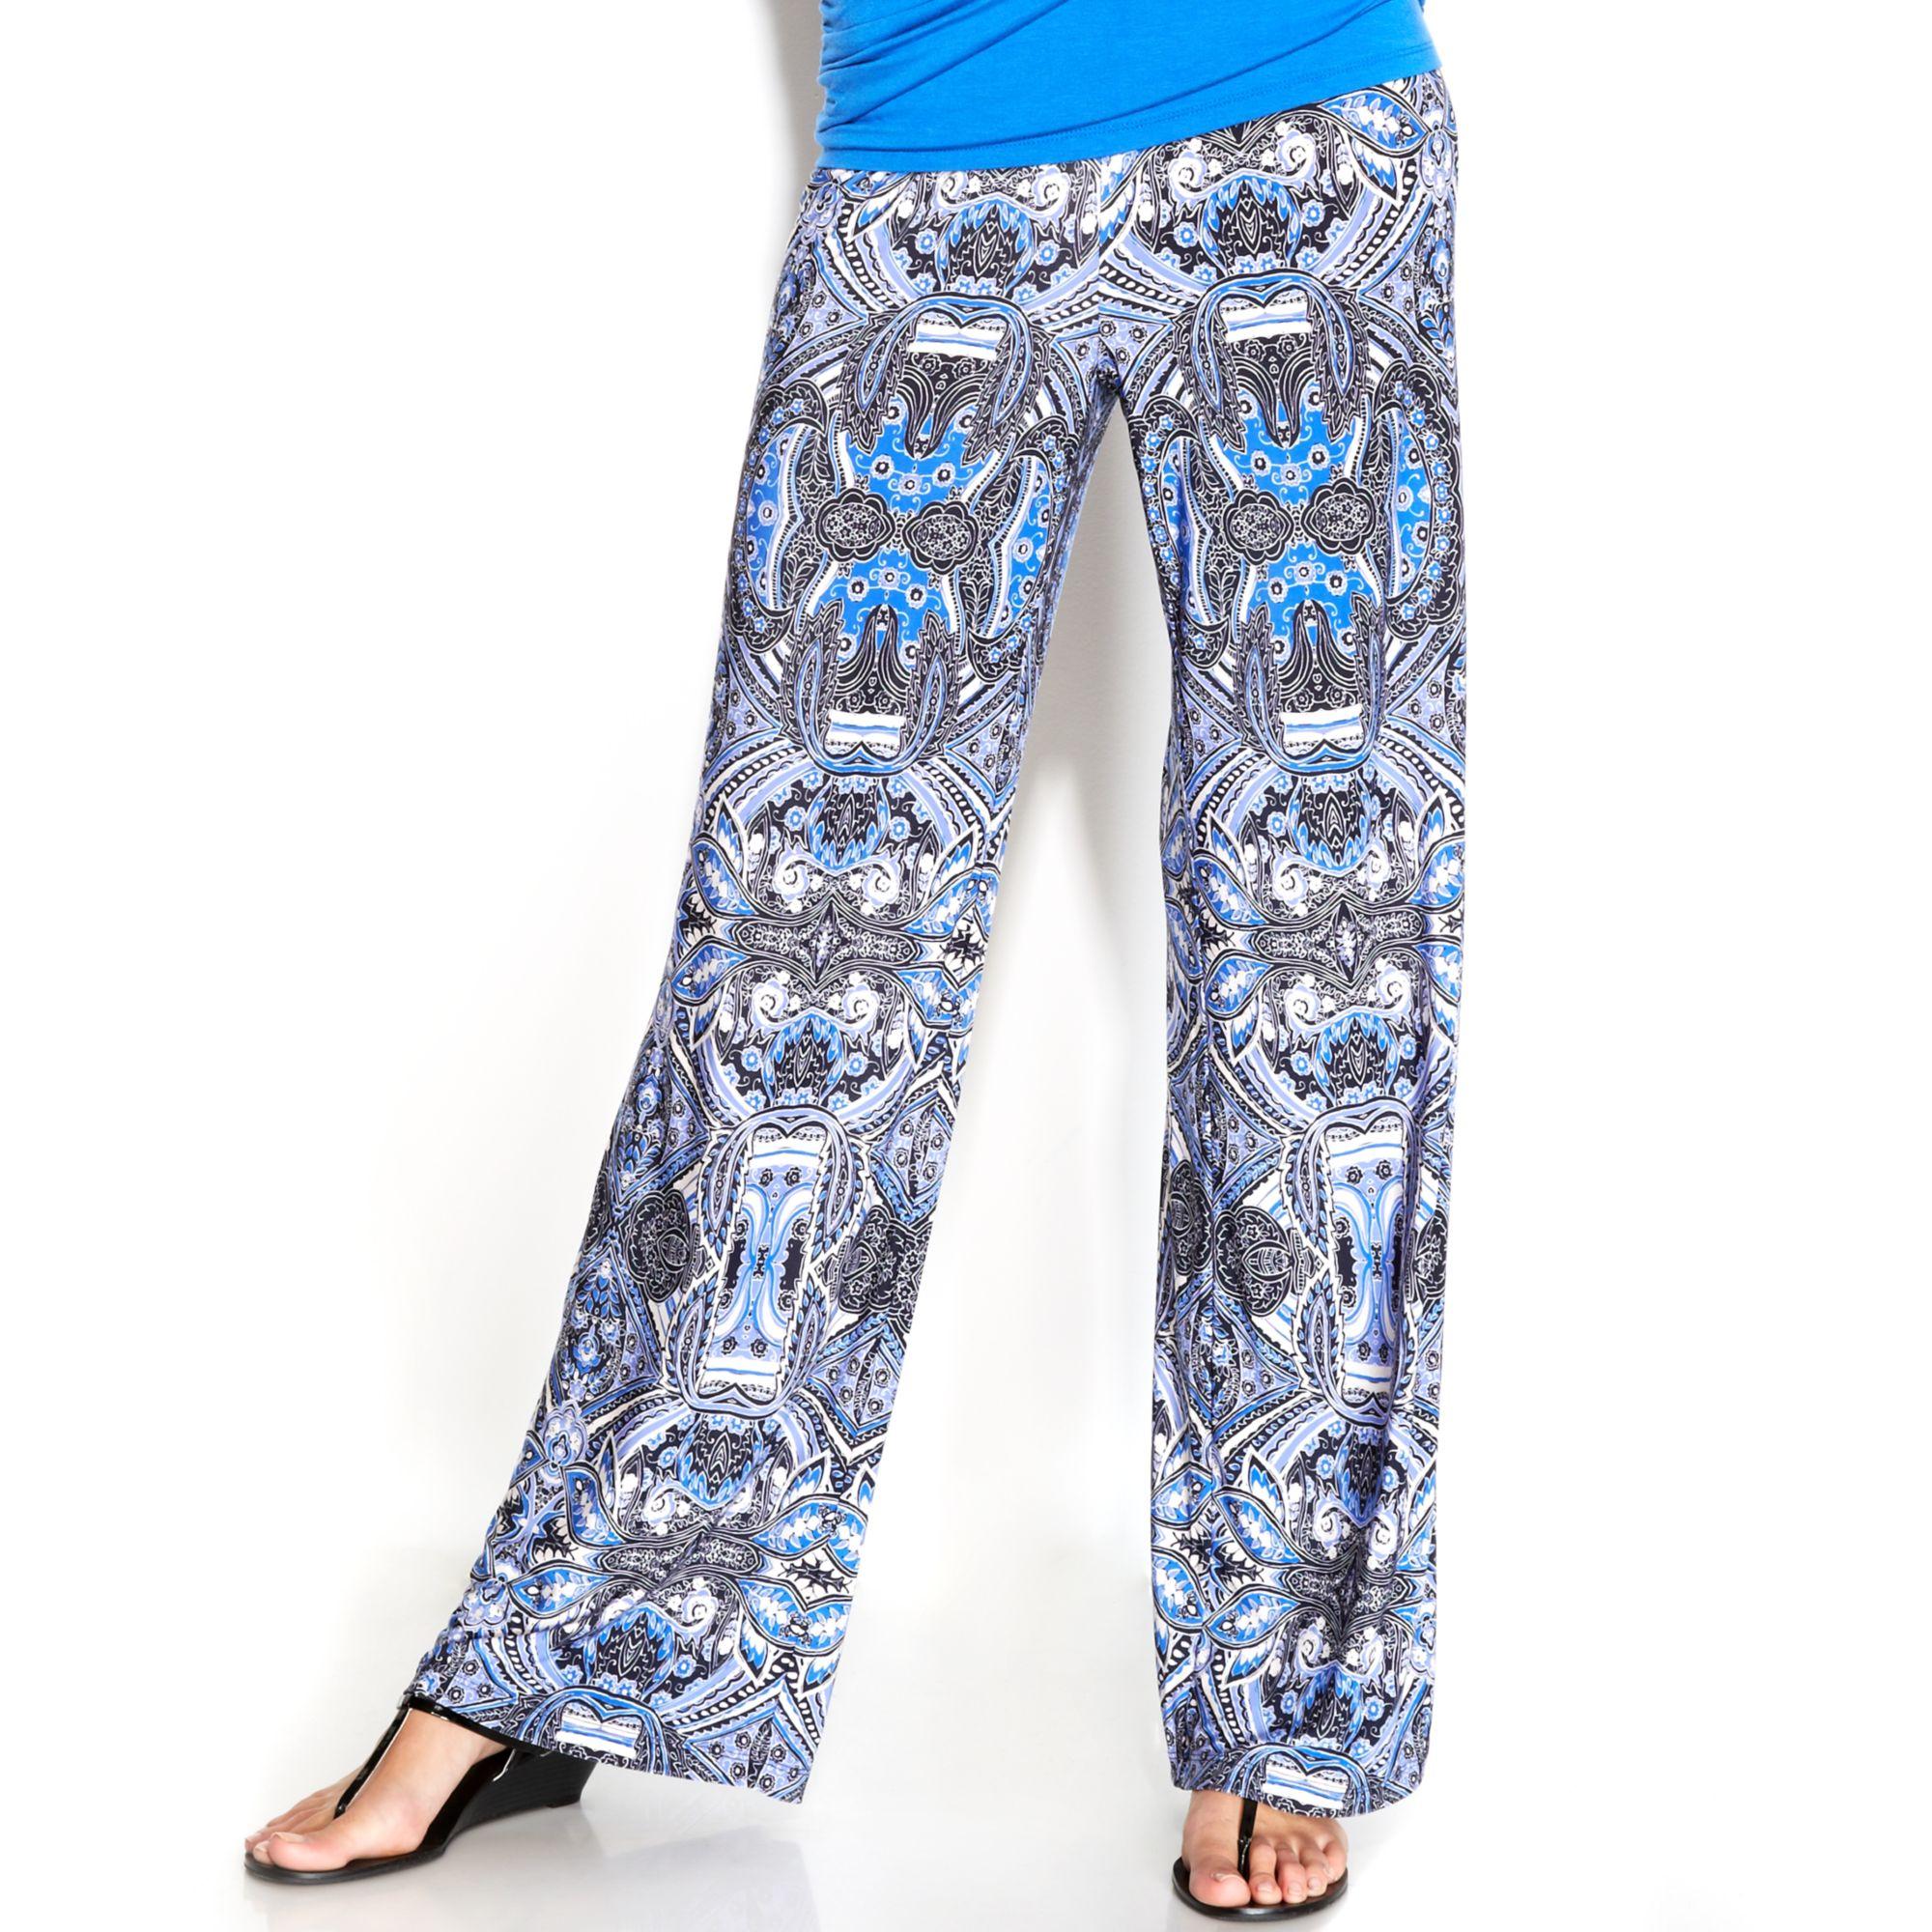 Inc Wide Leg Pants